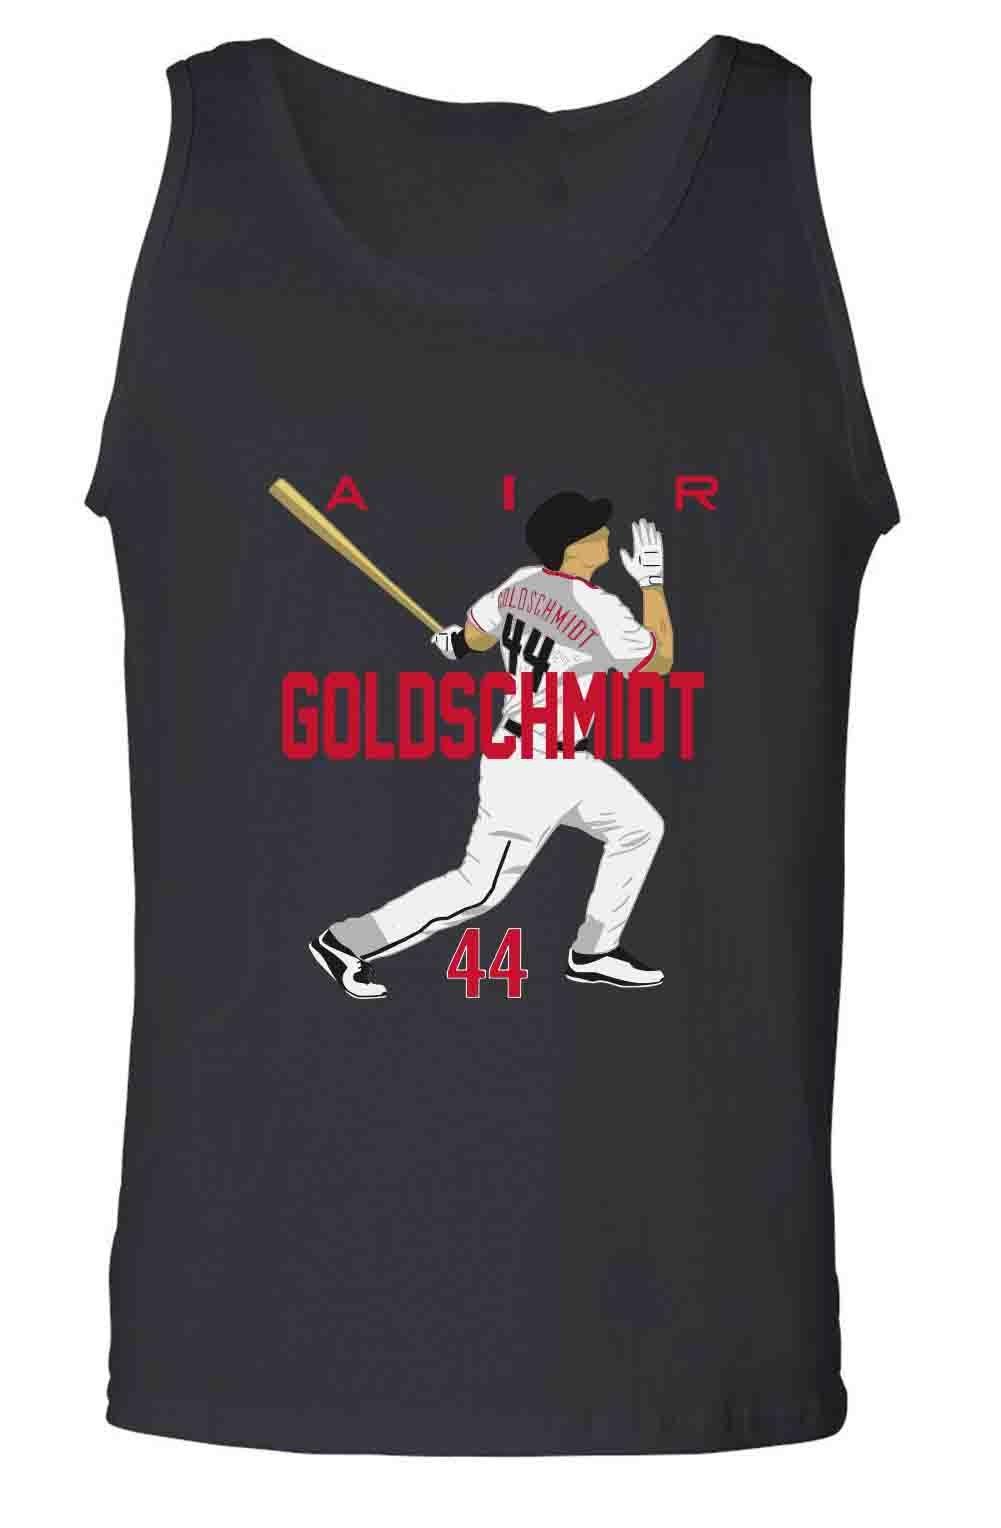 Black Paul Goldschmidt Air Hr New Tank Top Shirts